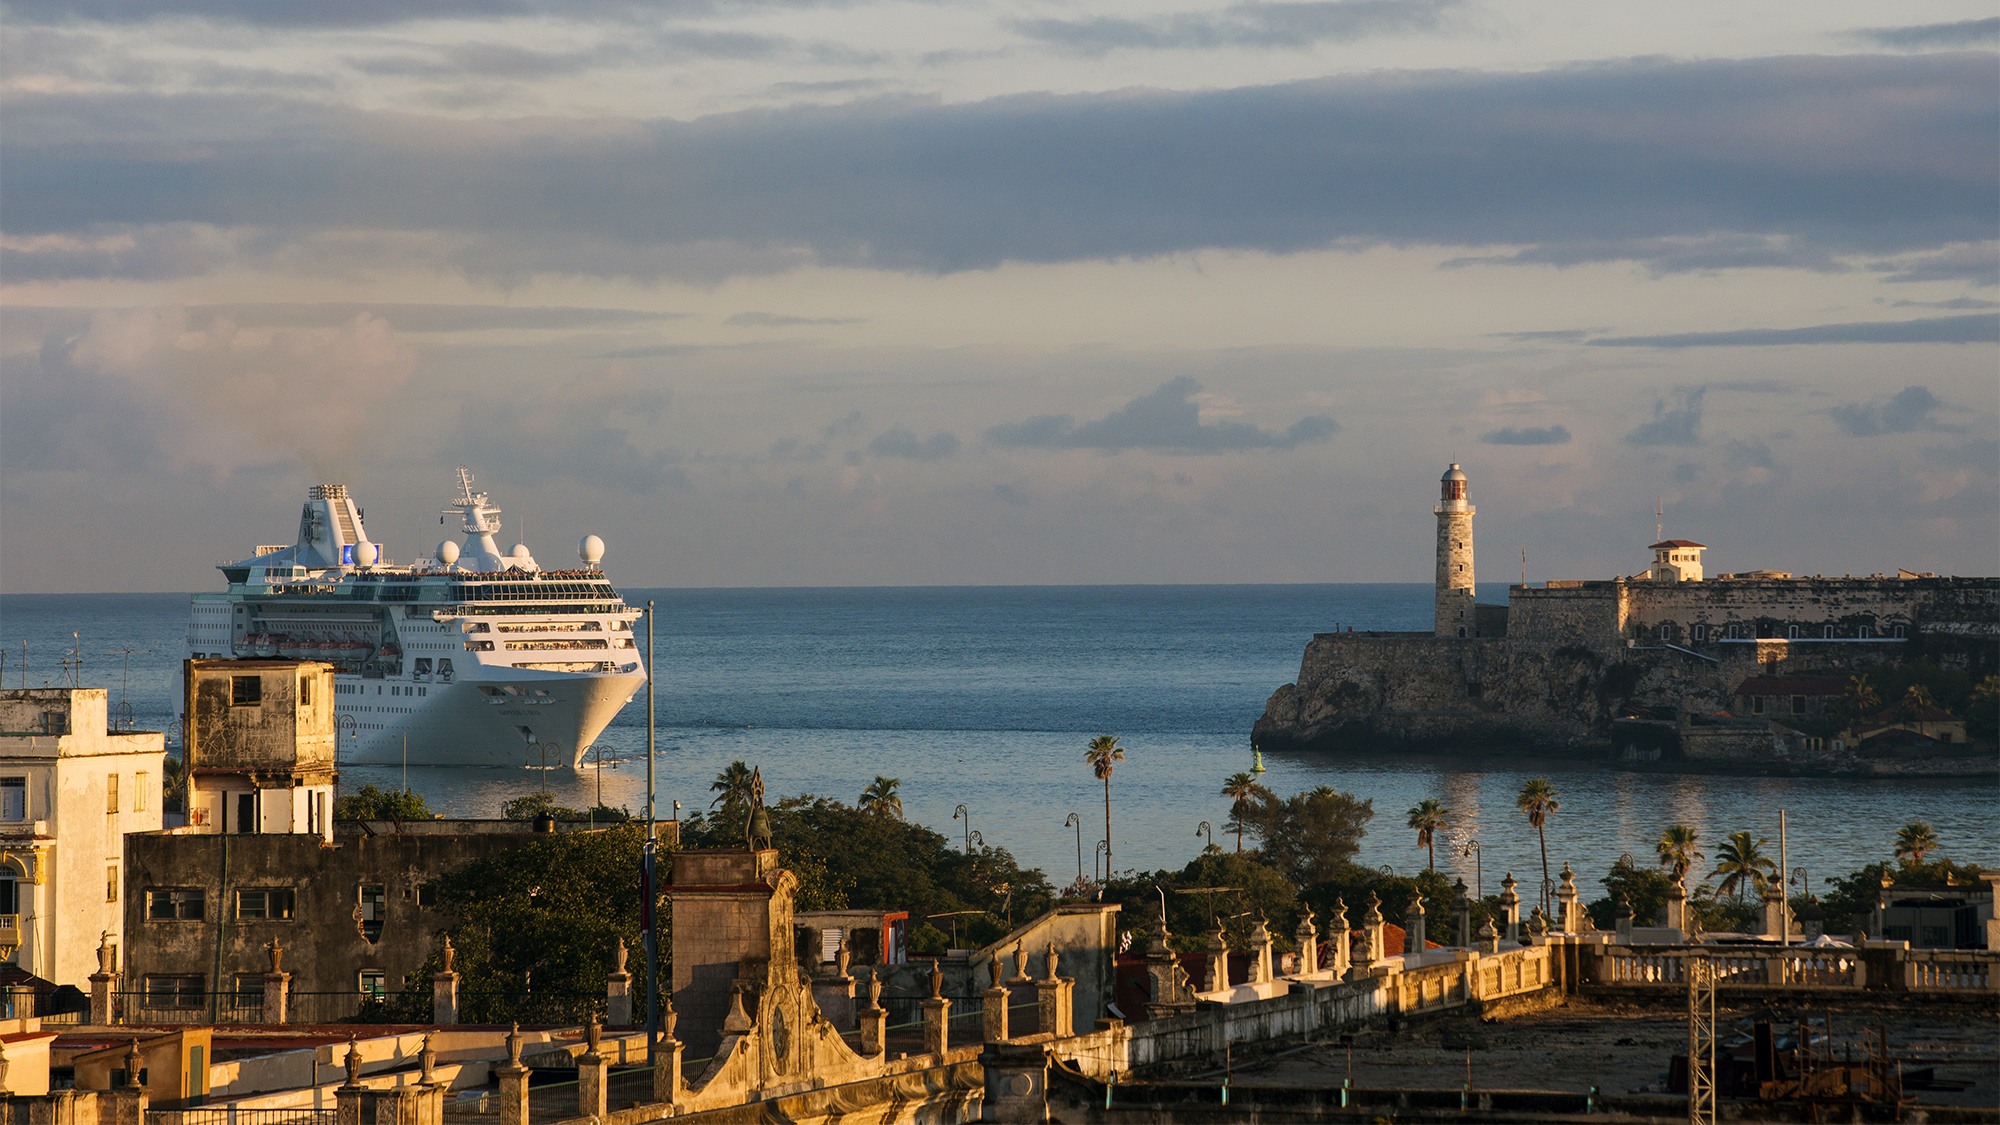 Royal Caribbean Continuing Cuba Sailings From Tampa In 2018 Travel Weekly